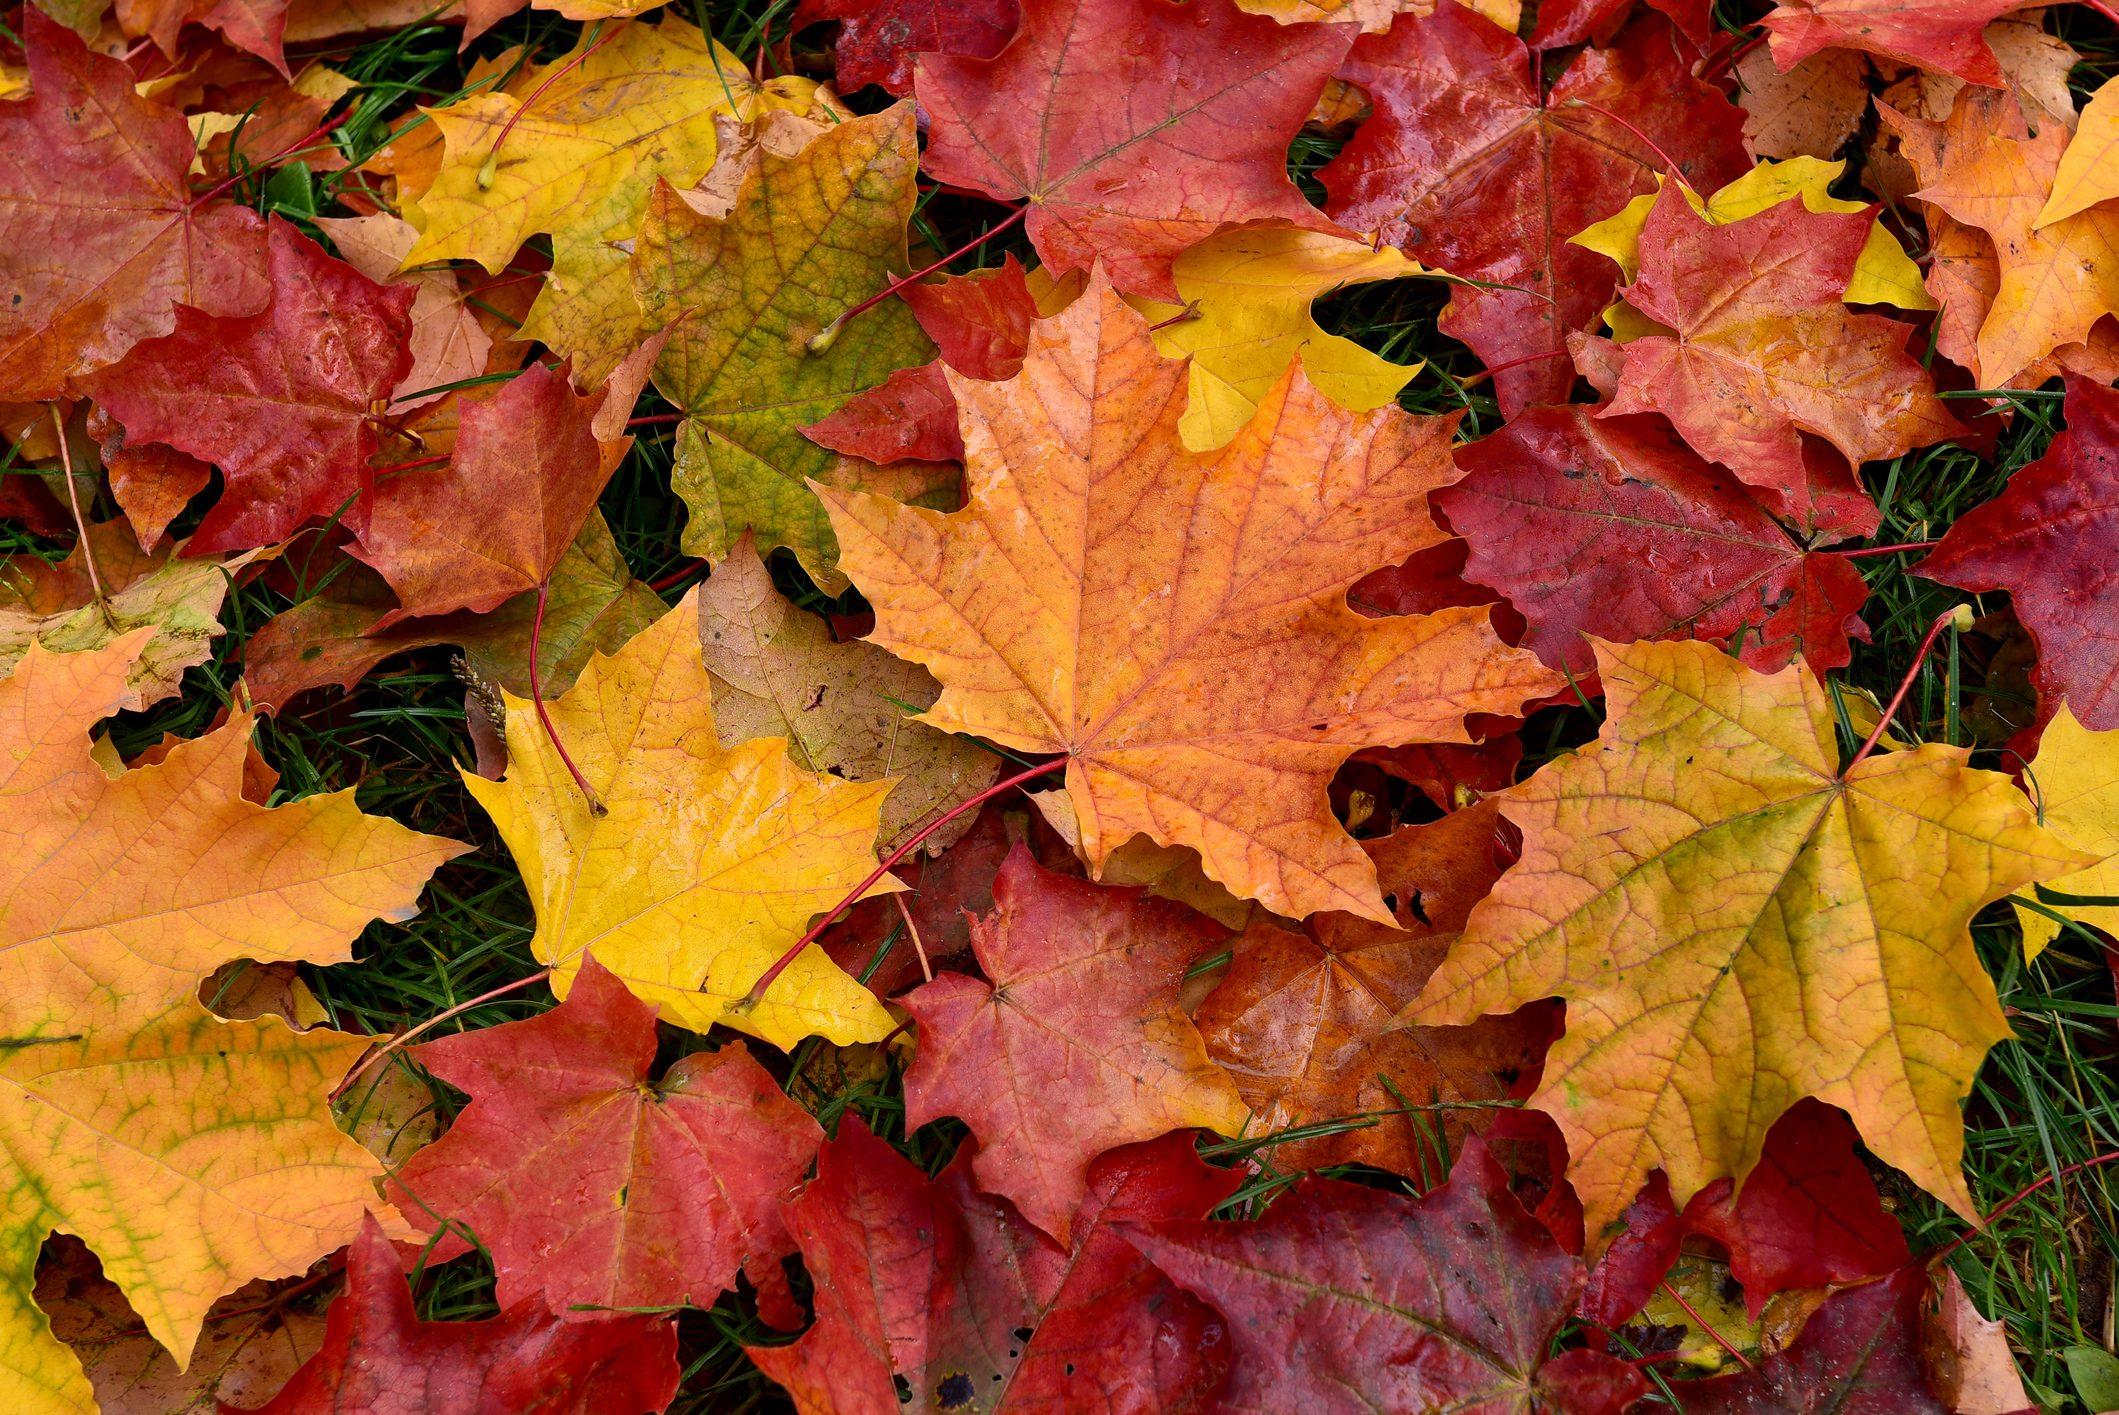 Autumn. Multicolored fallen leaves.